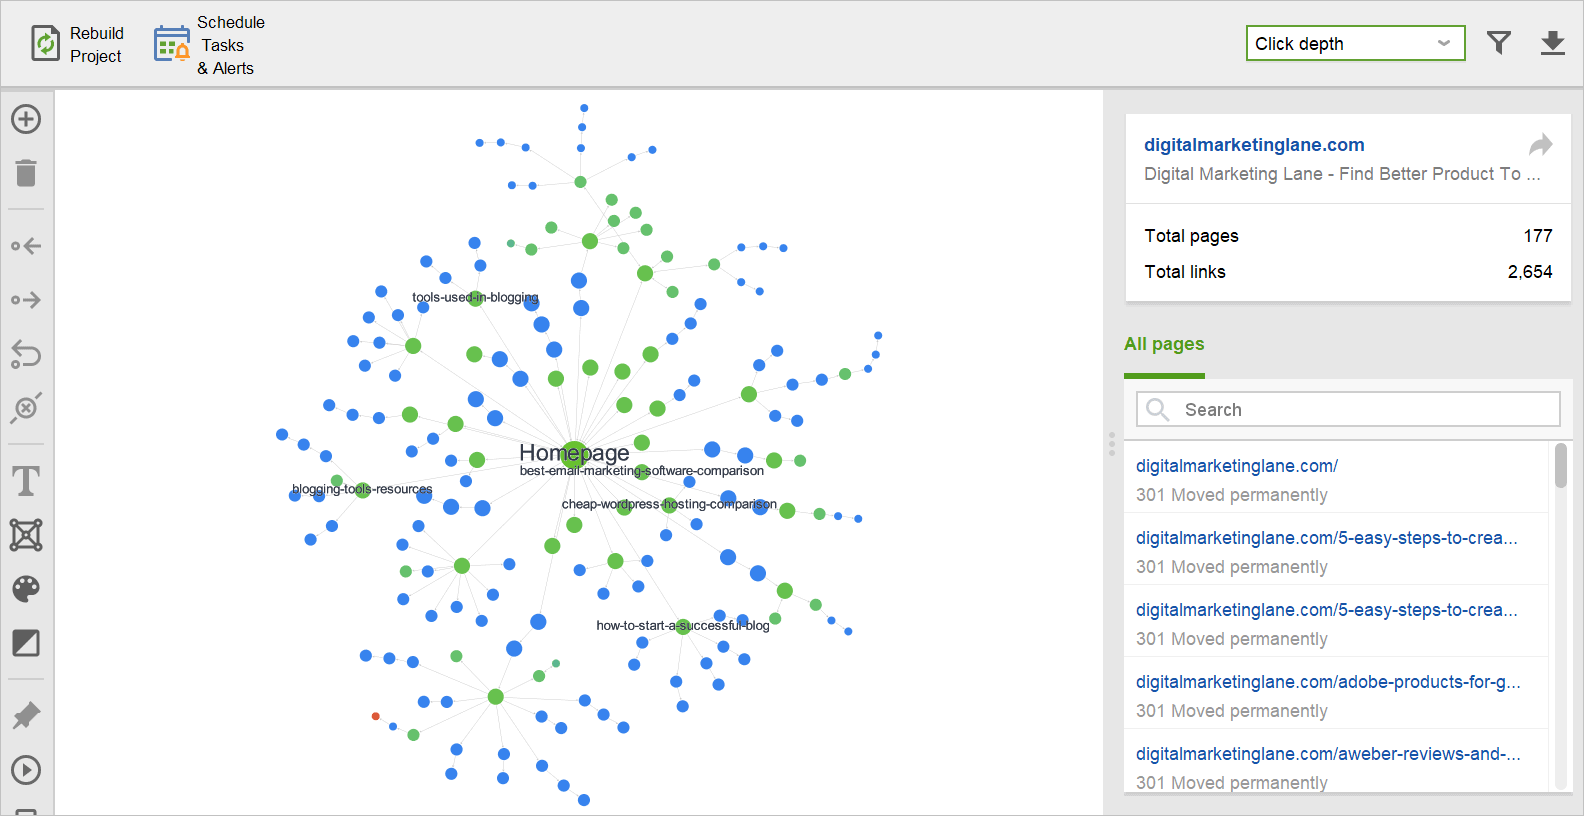 SEO Powersuite Visualisations